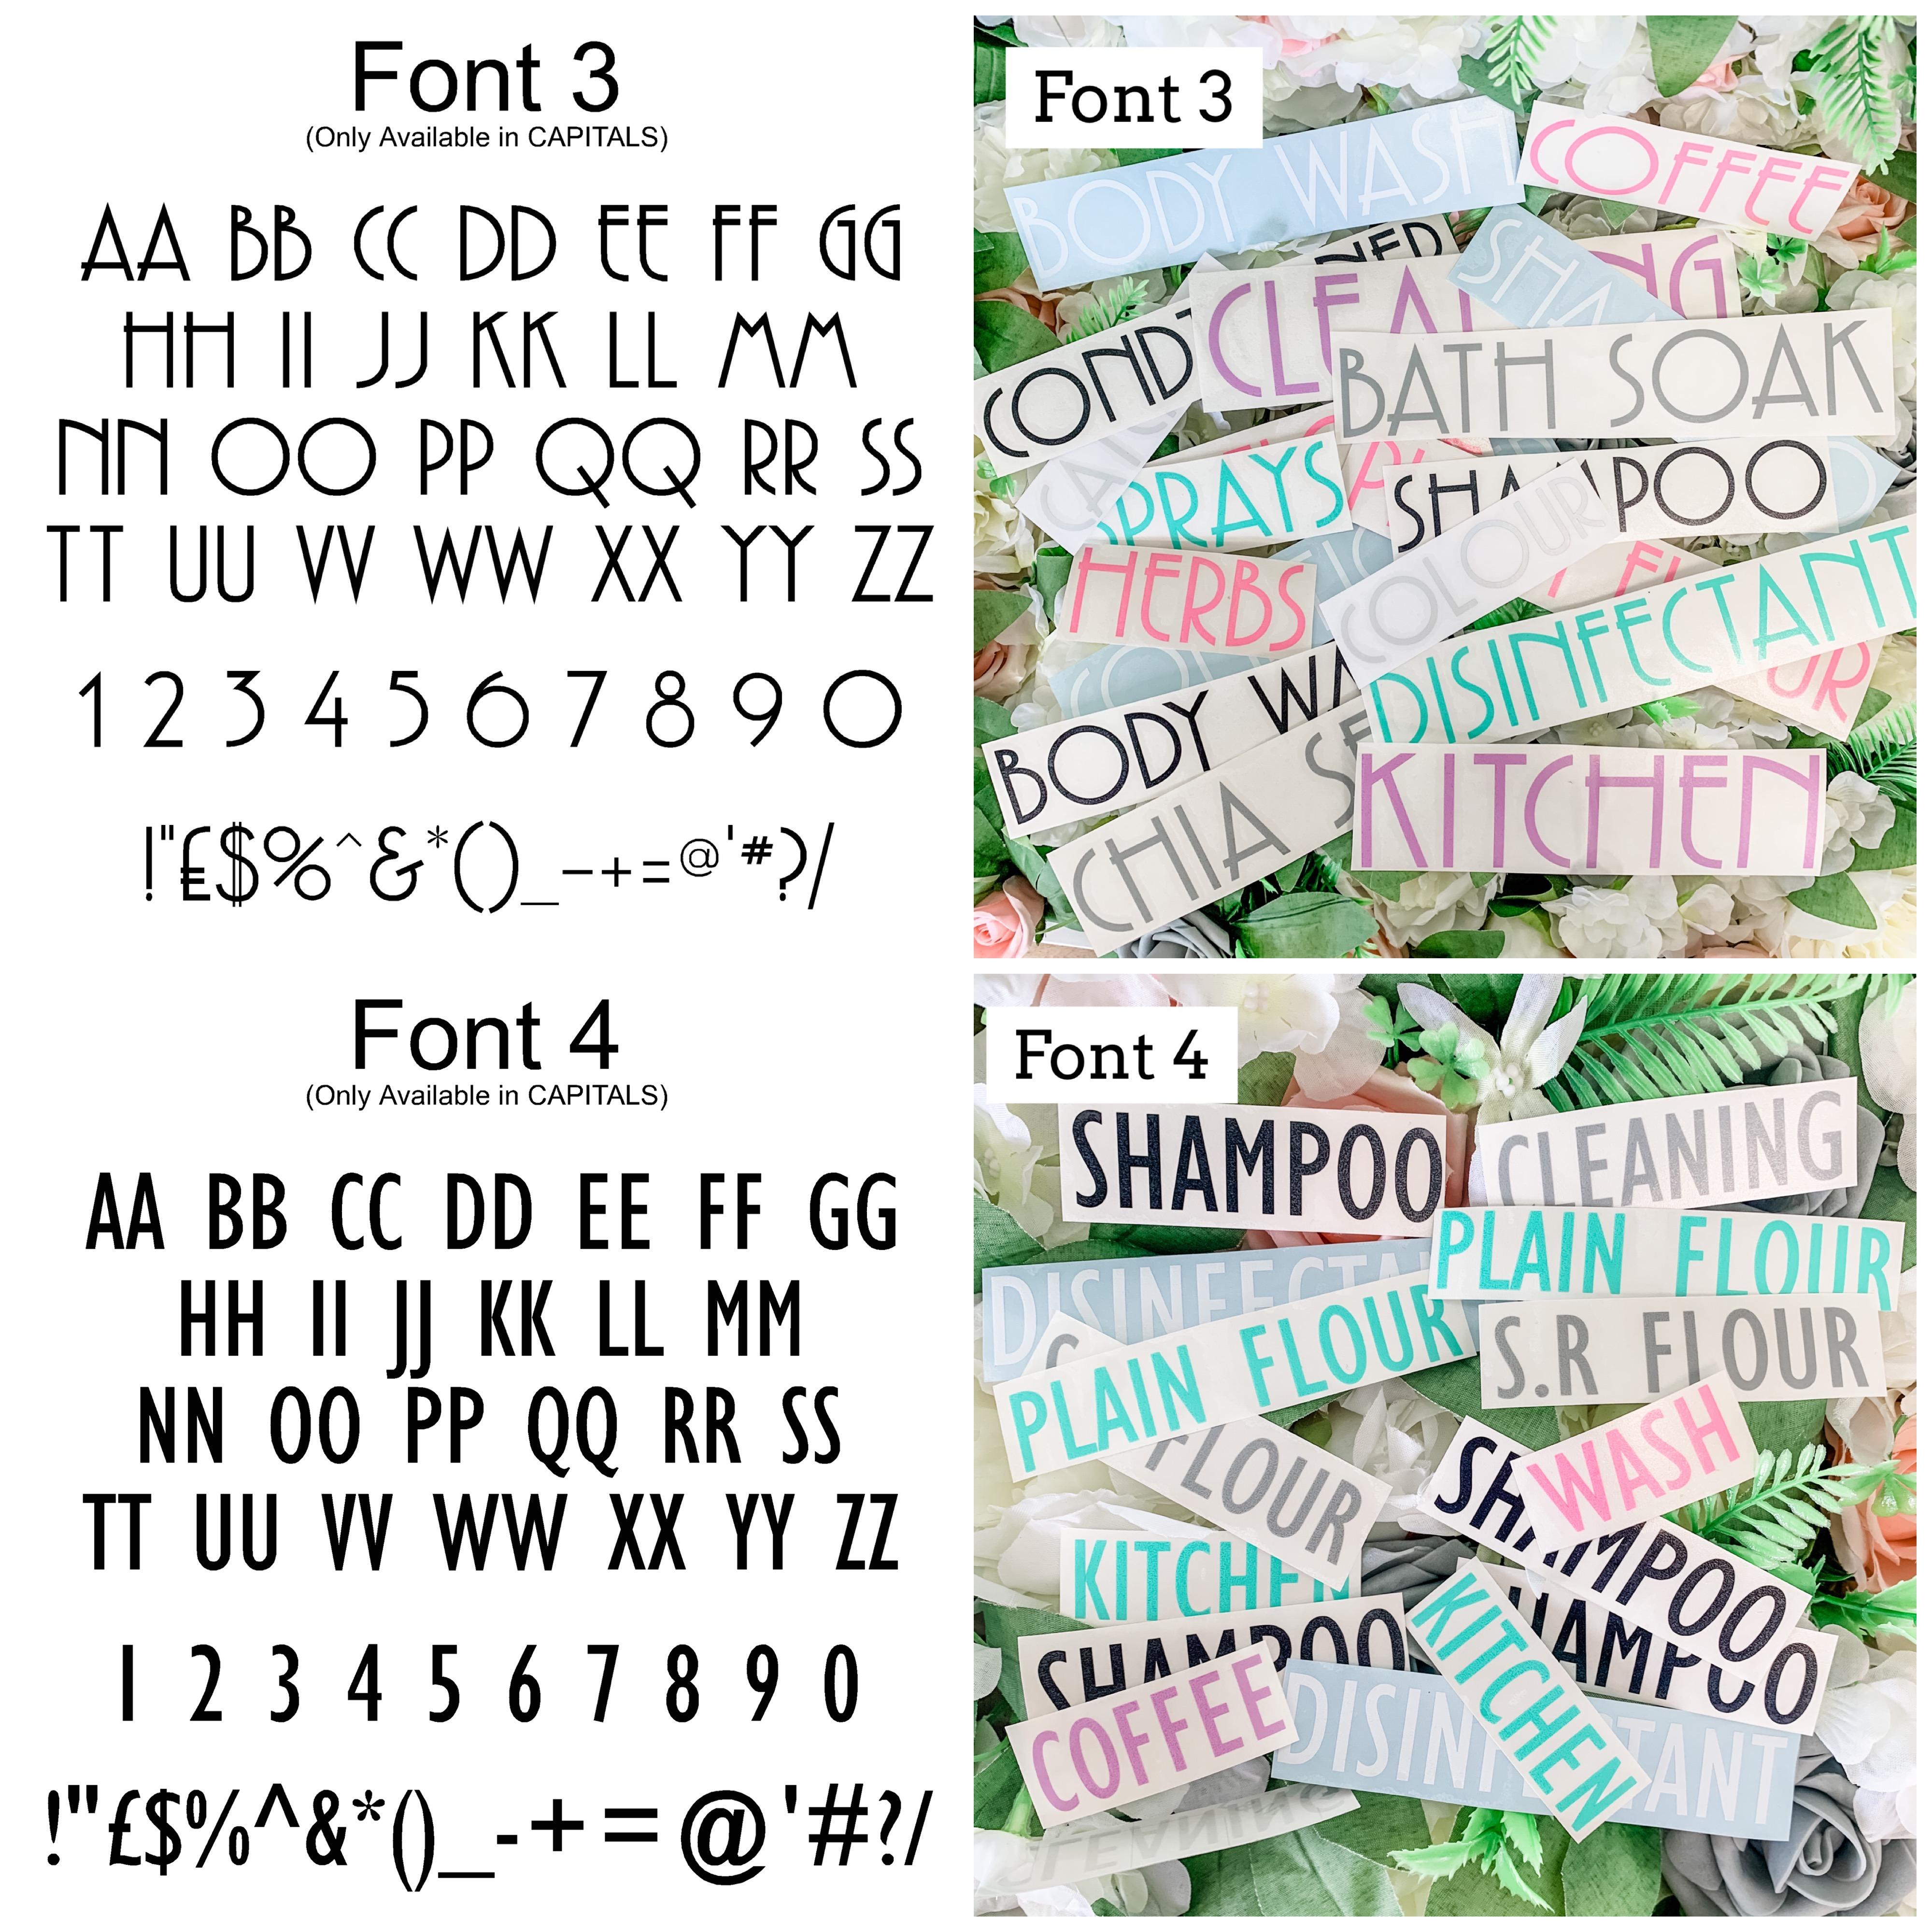 52f86c8f-e472-45b3-868a-f263ef0521c8.jpeg